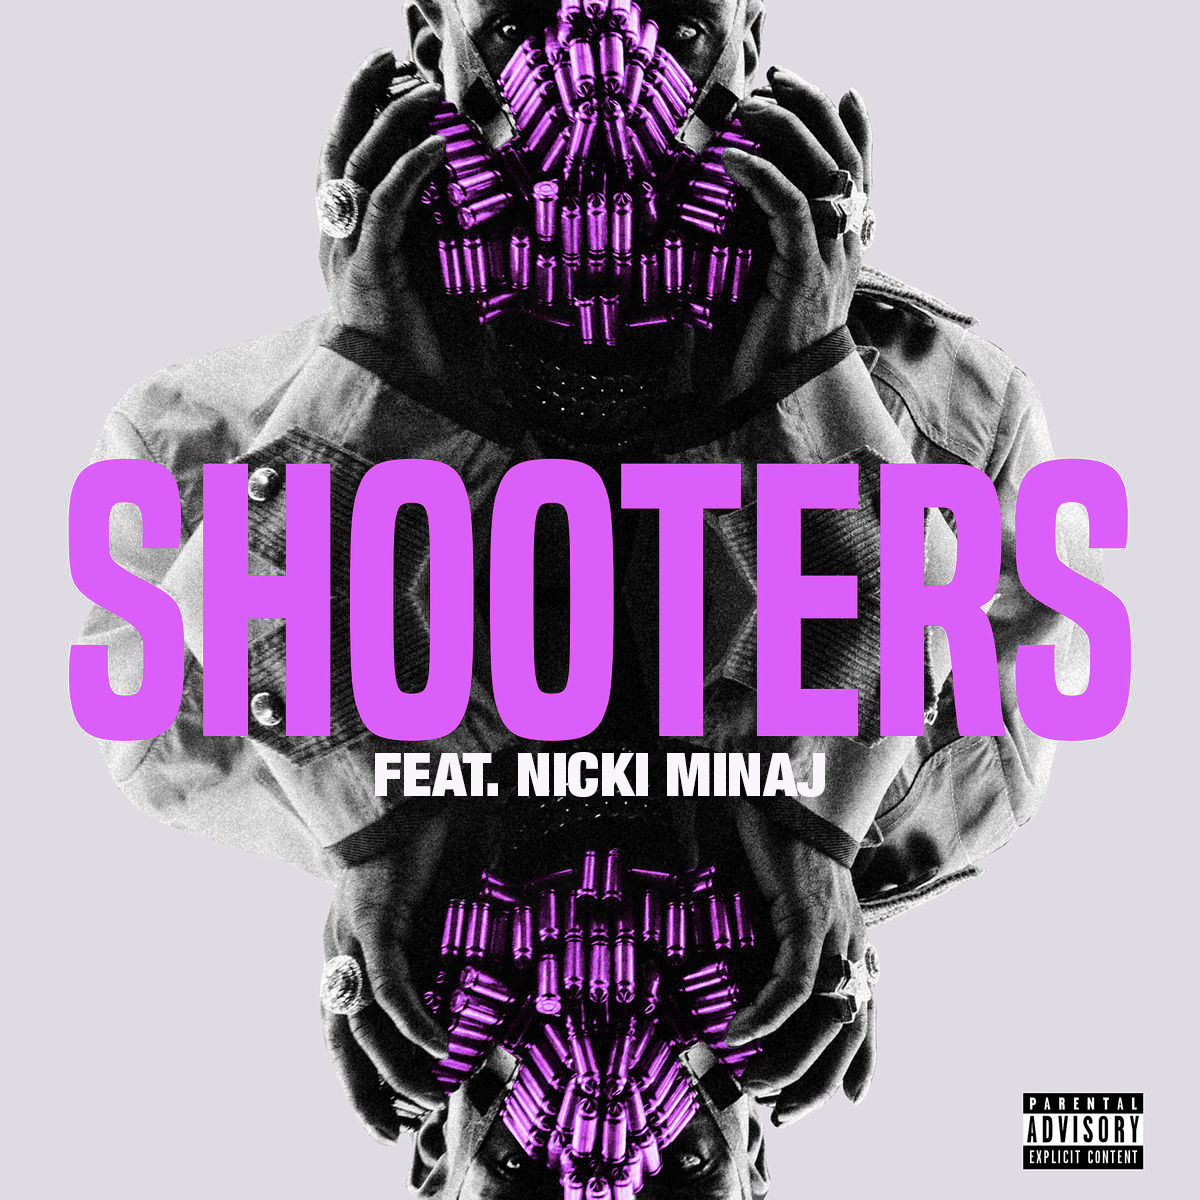 Tory Lanez – Shooters (Feat. Nicki Minaj) [Stream + Téléchargement +Traduction]